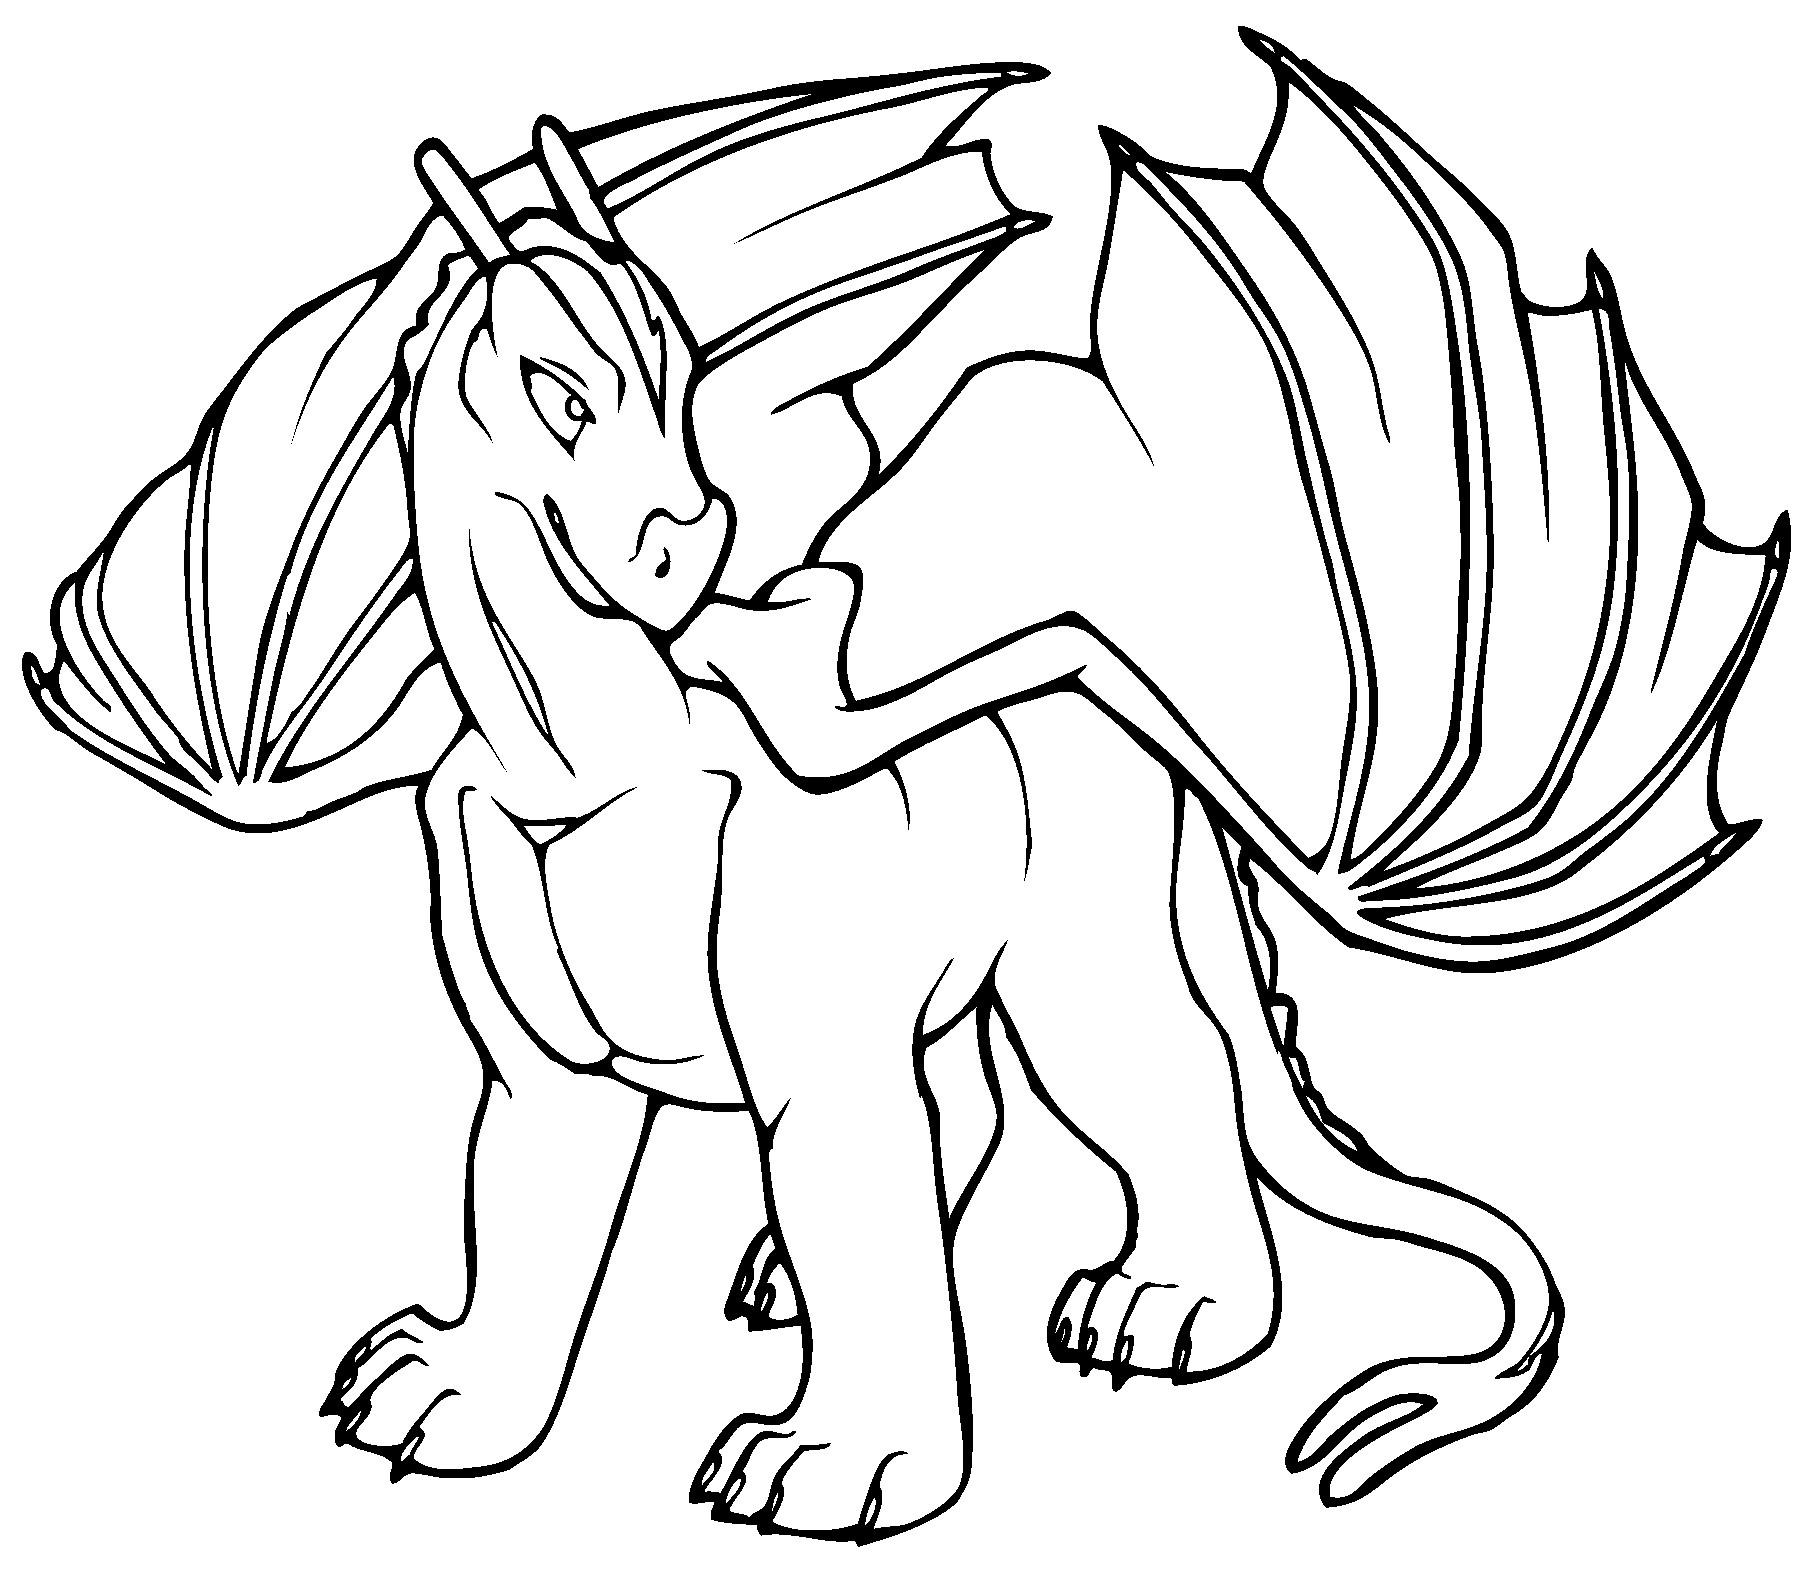 Coloring Pages Com  Dragons Coloring Pages coloringsuite